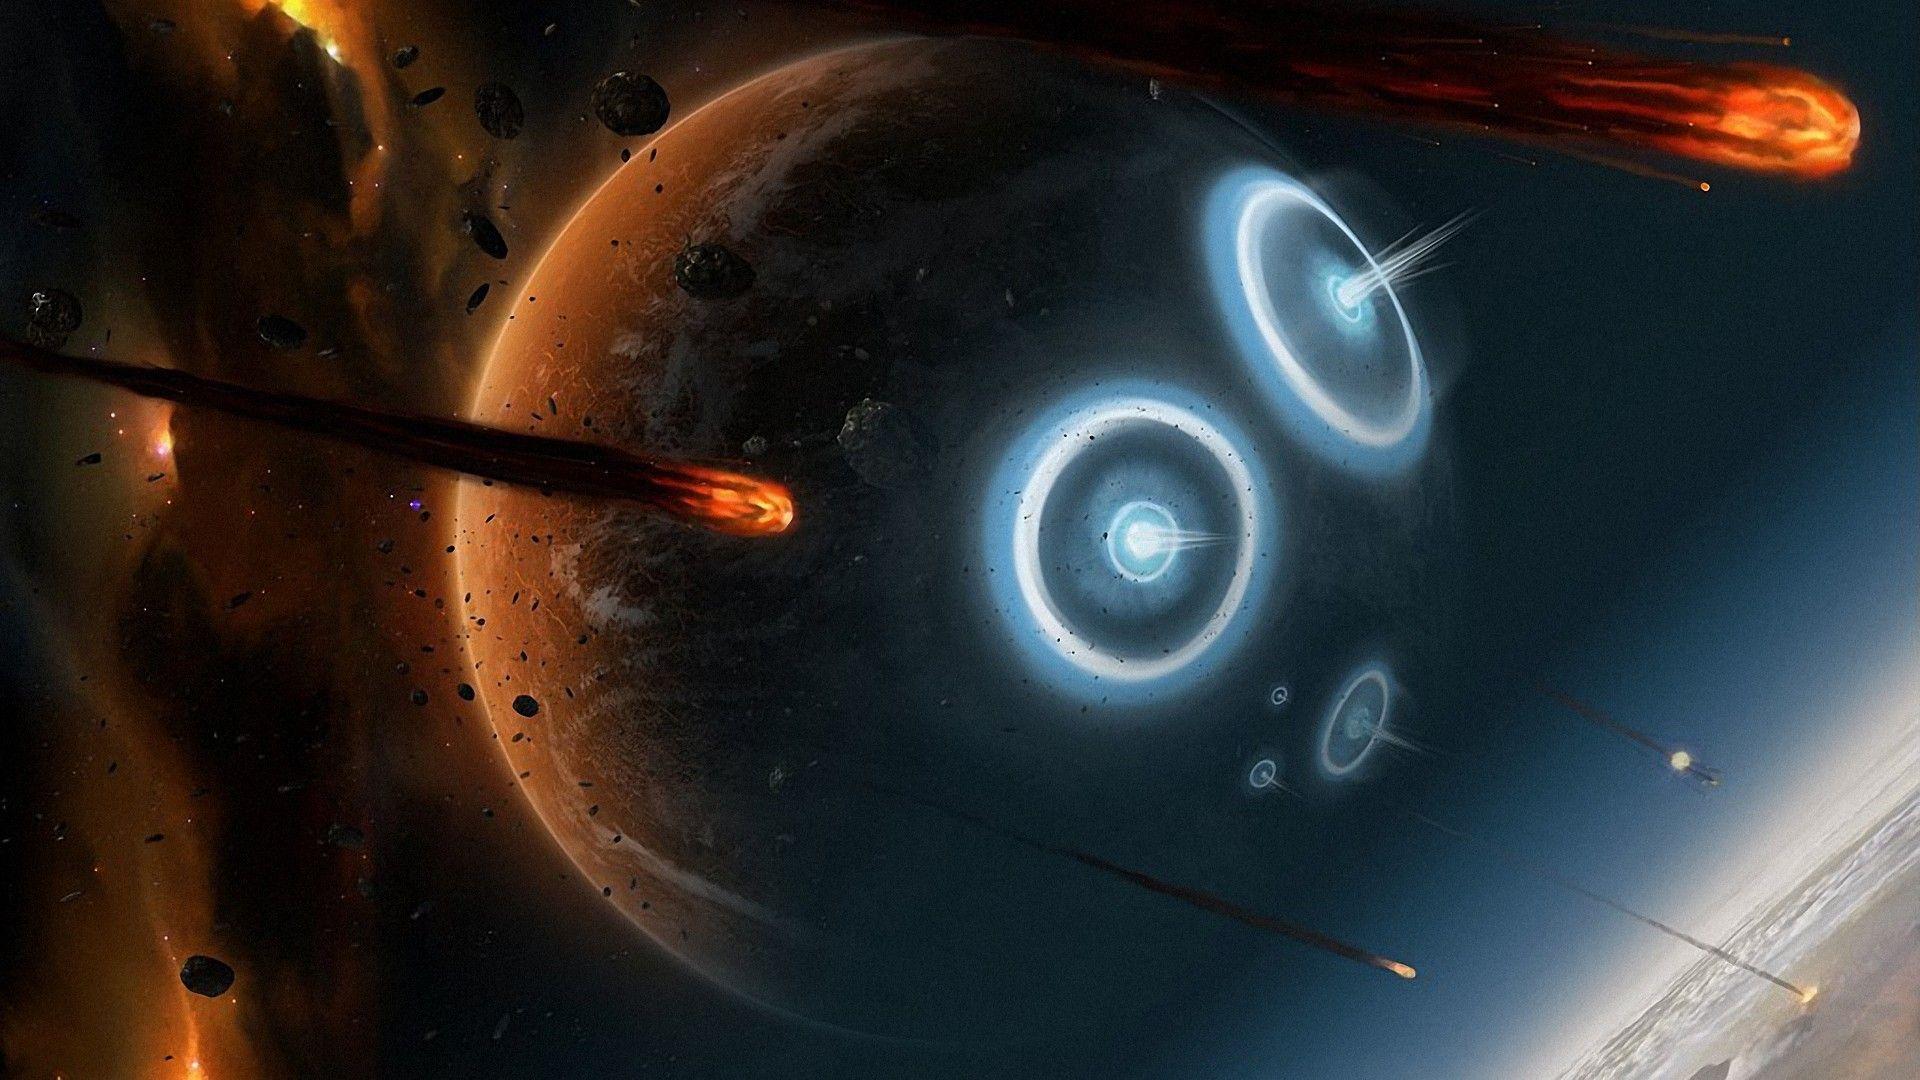 Battles Science Fiction Meteor Shower Meteoroid Skies Wallpaper Space Artwork Wallpaper Space Sci Fi Wallpaper